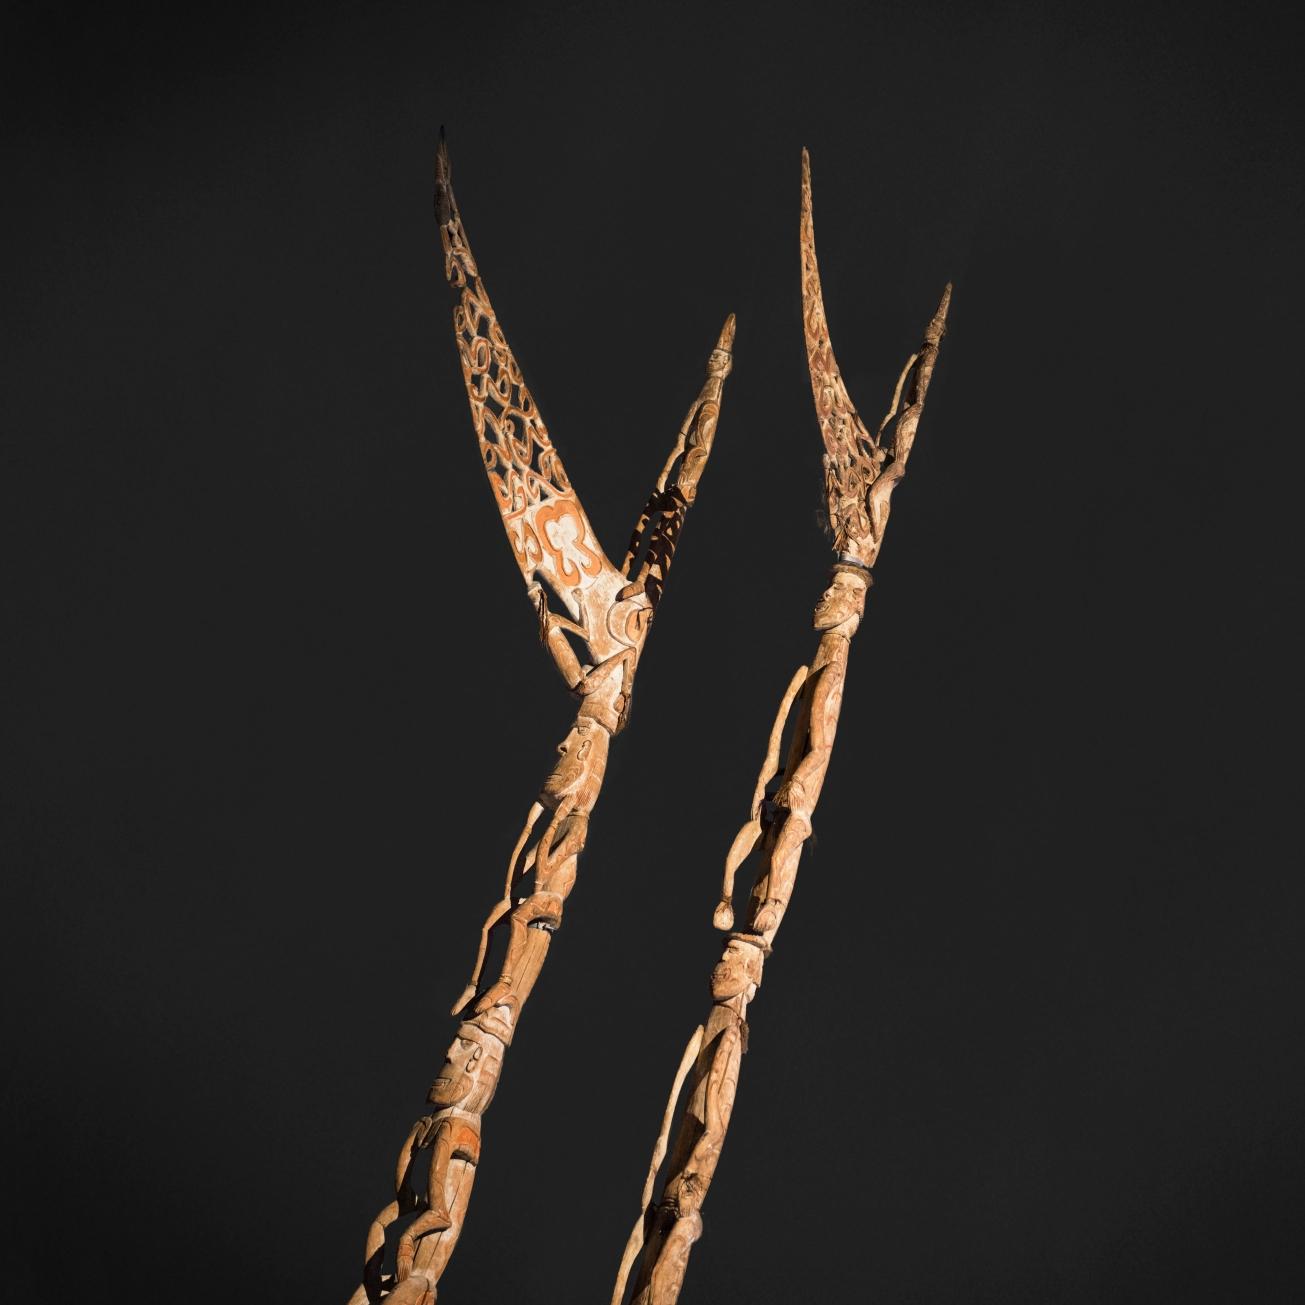 moesgaard museum, de etnografiske samlinger, ethnography, collections, museum, aarhus, denmark, bisj pole, asmat